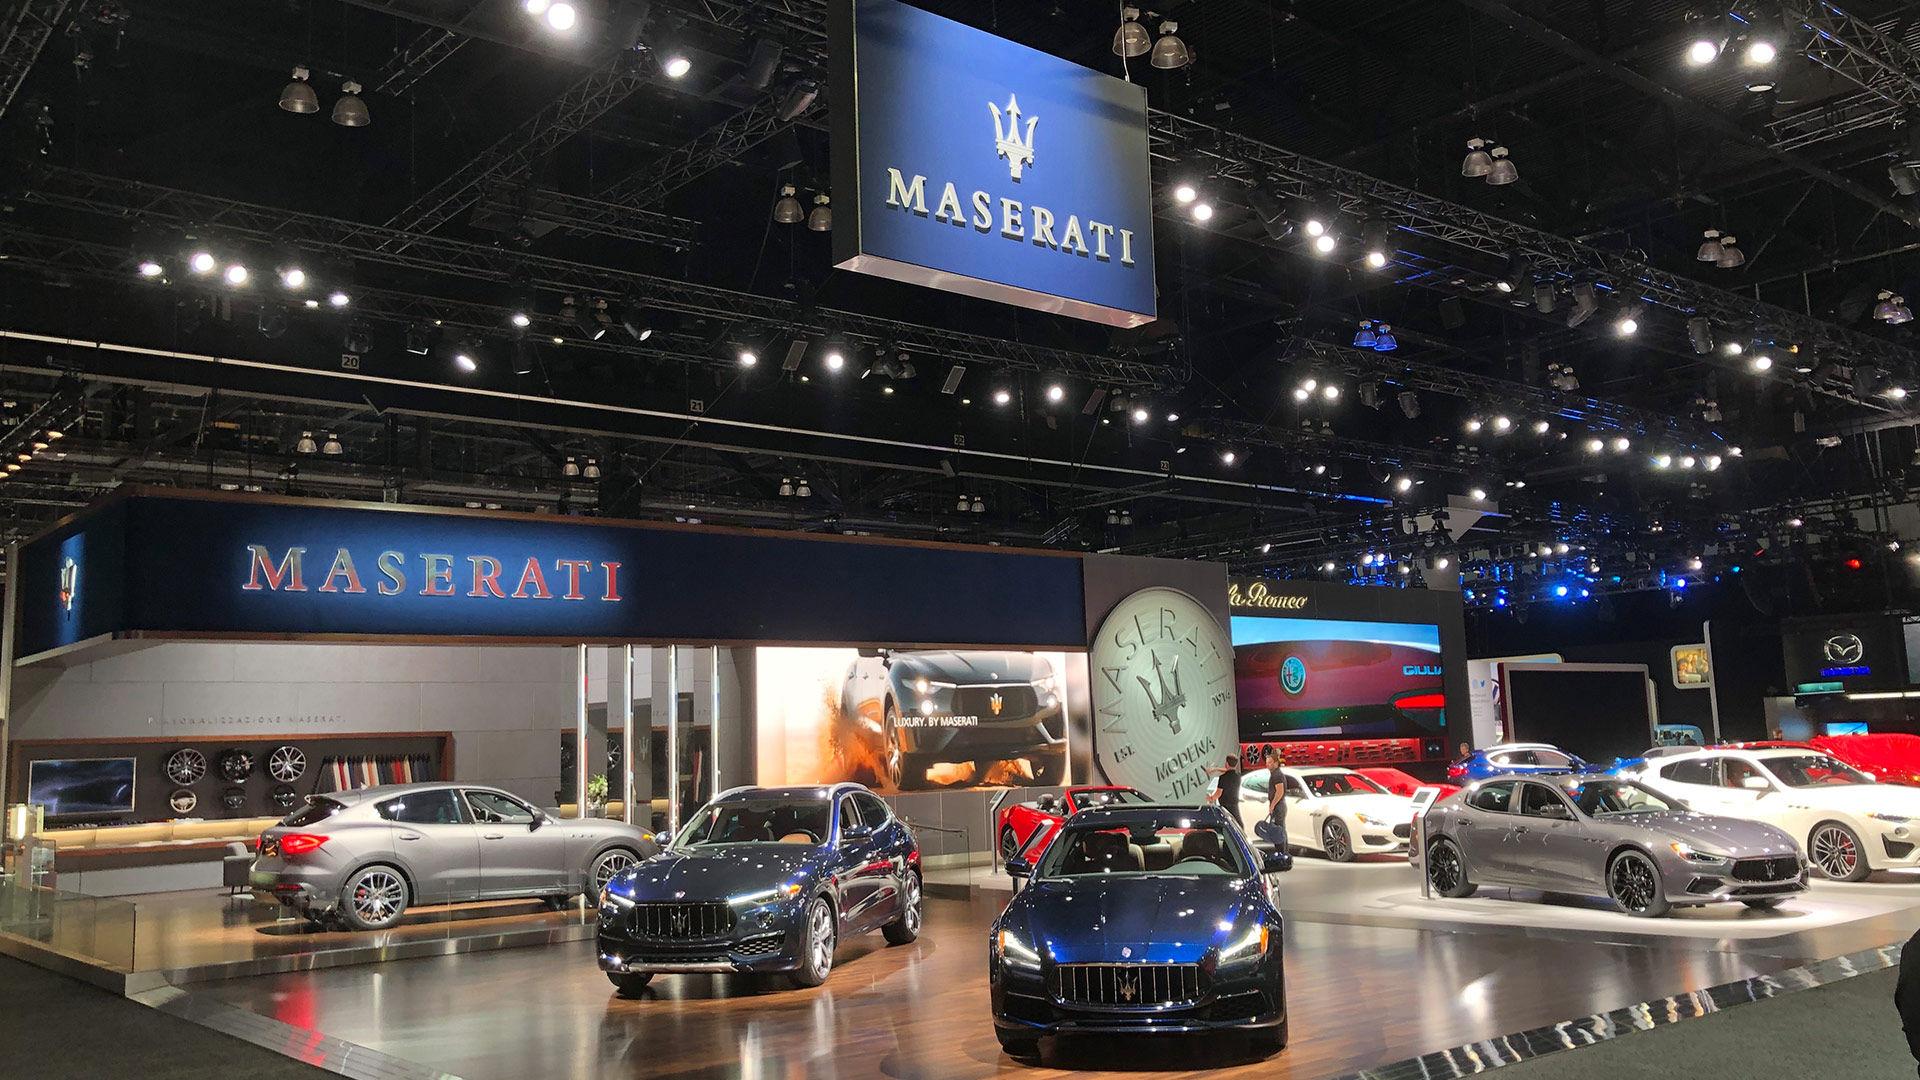 Maserati at the 2018 Los Angeles Auto Show